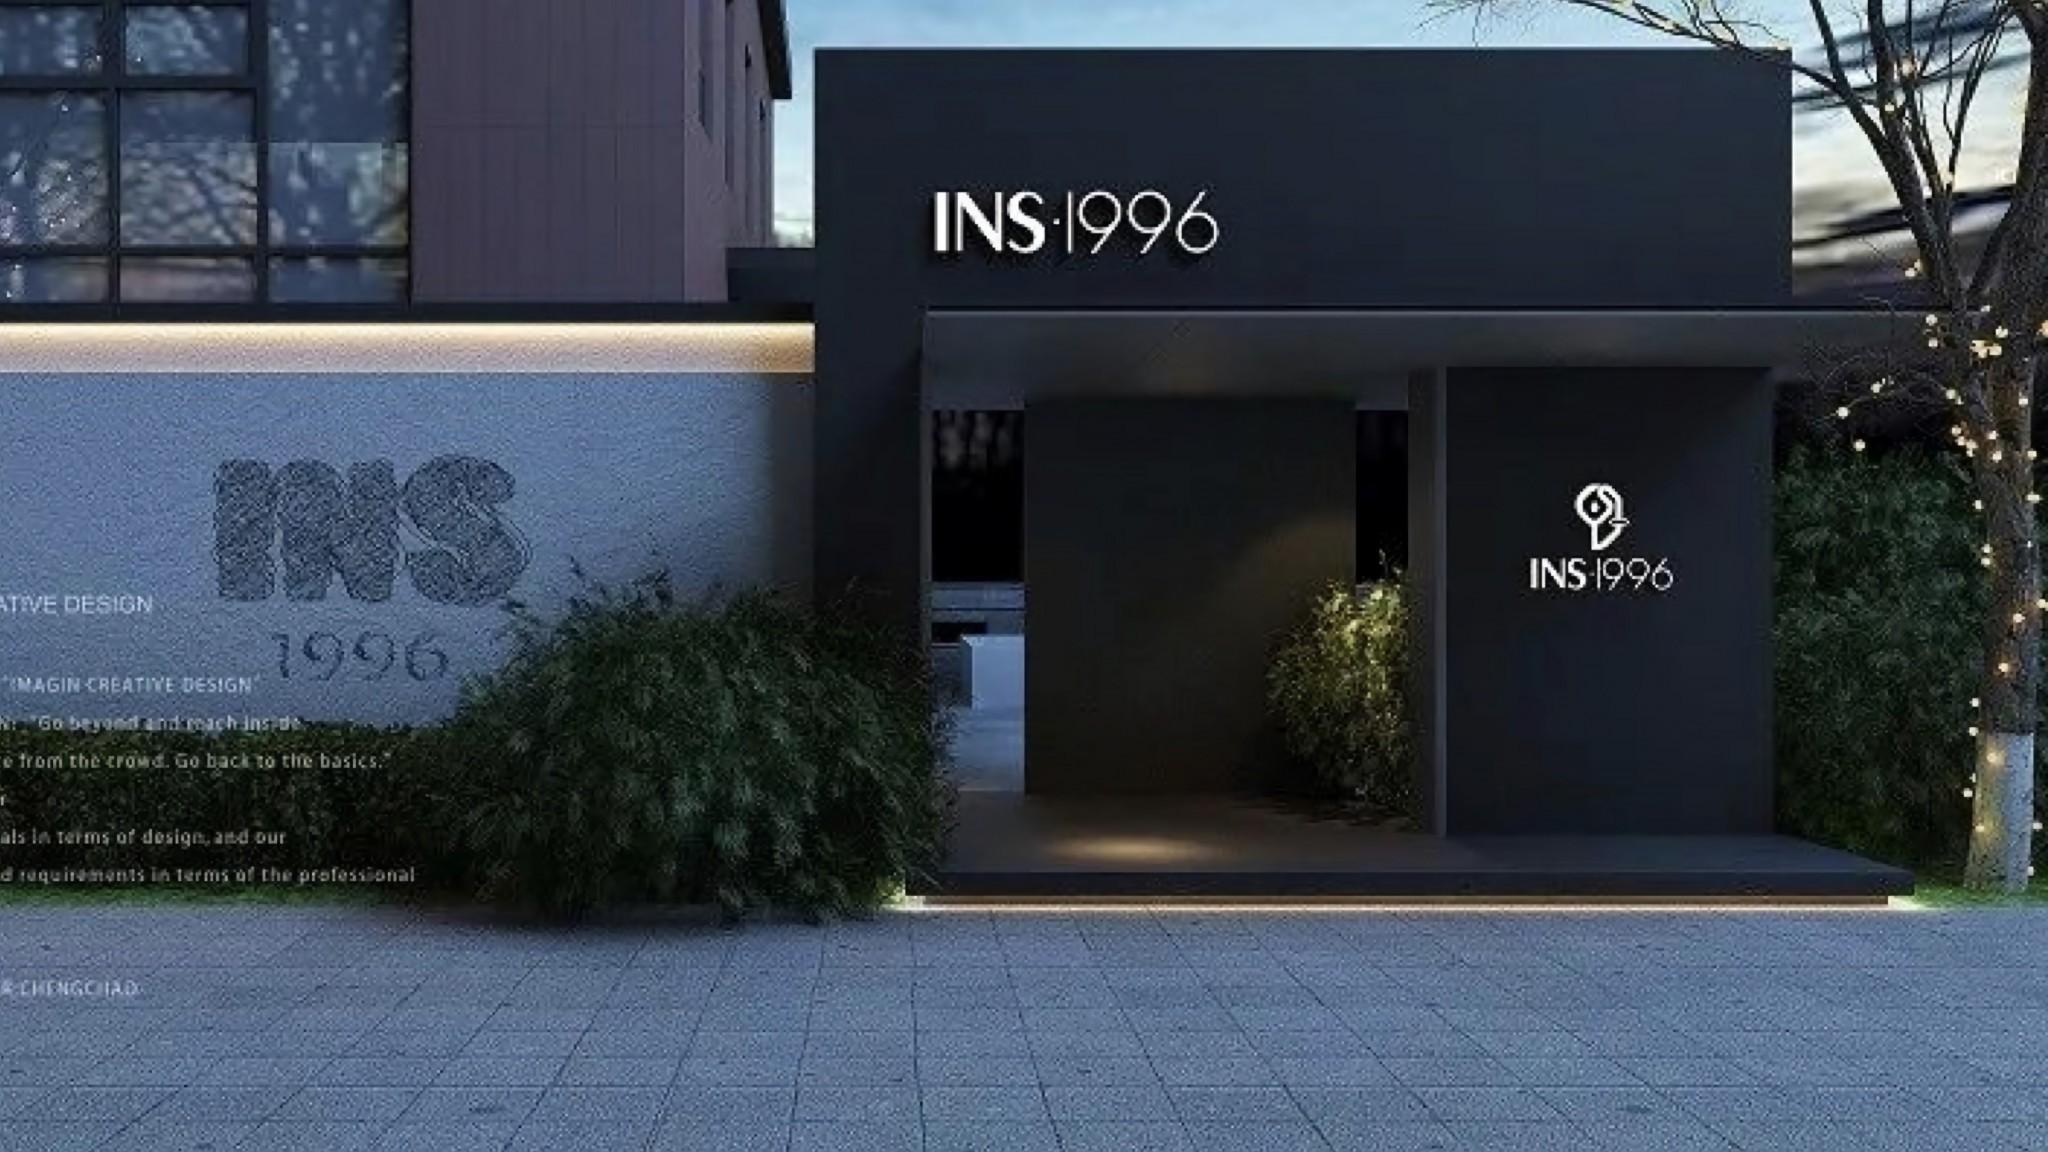 ins-1996